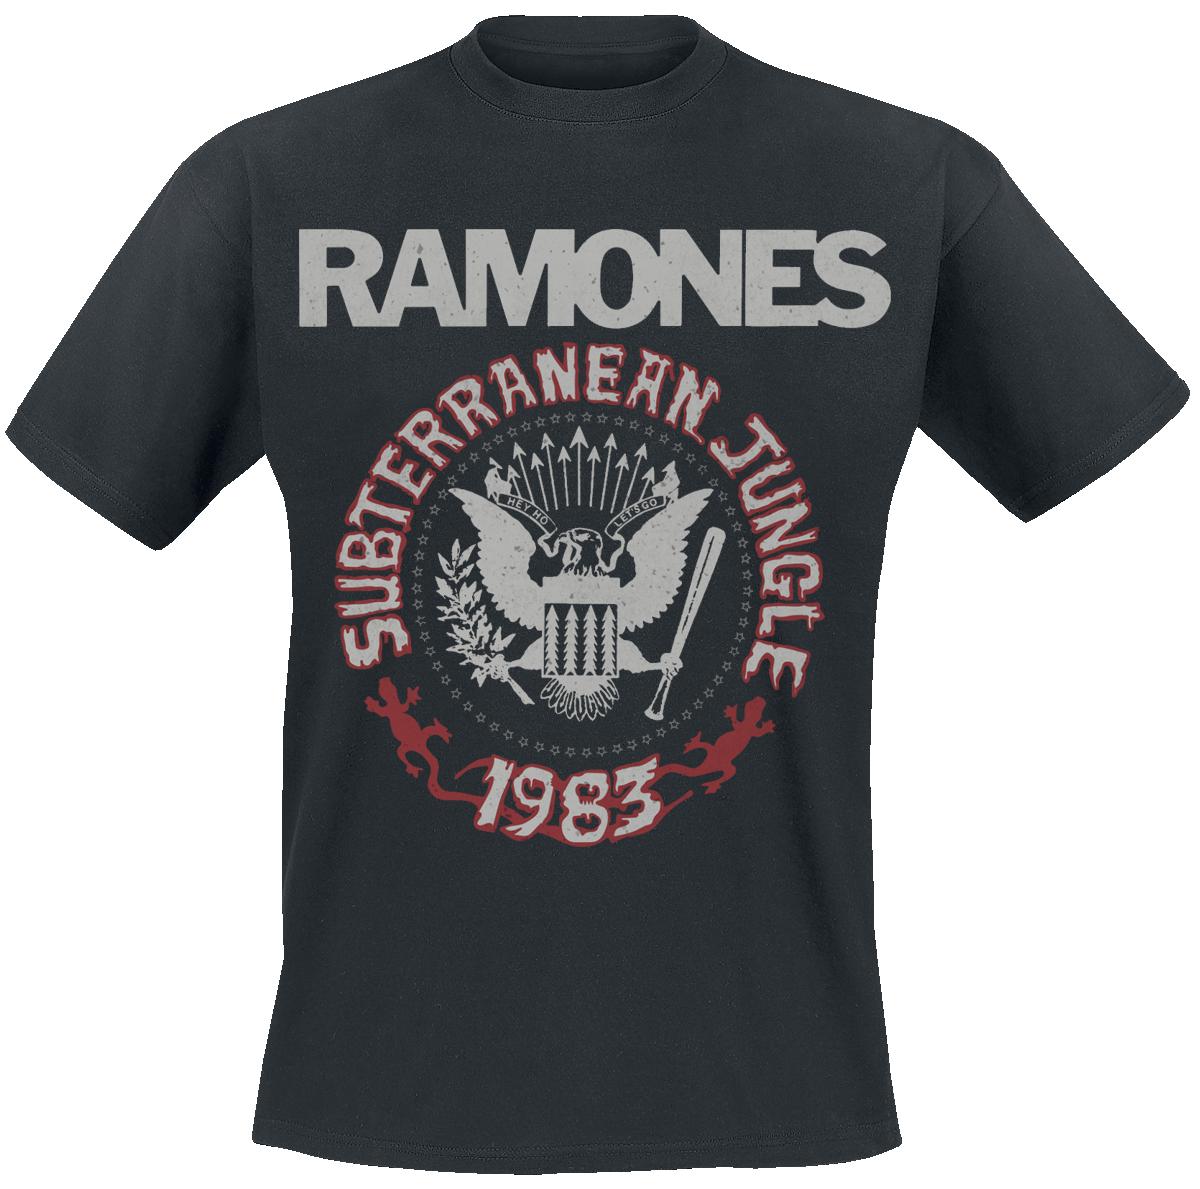 Ramones - Subterranean Jungle - T-Shirt - schwarz